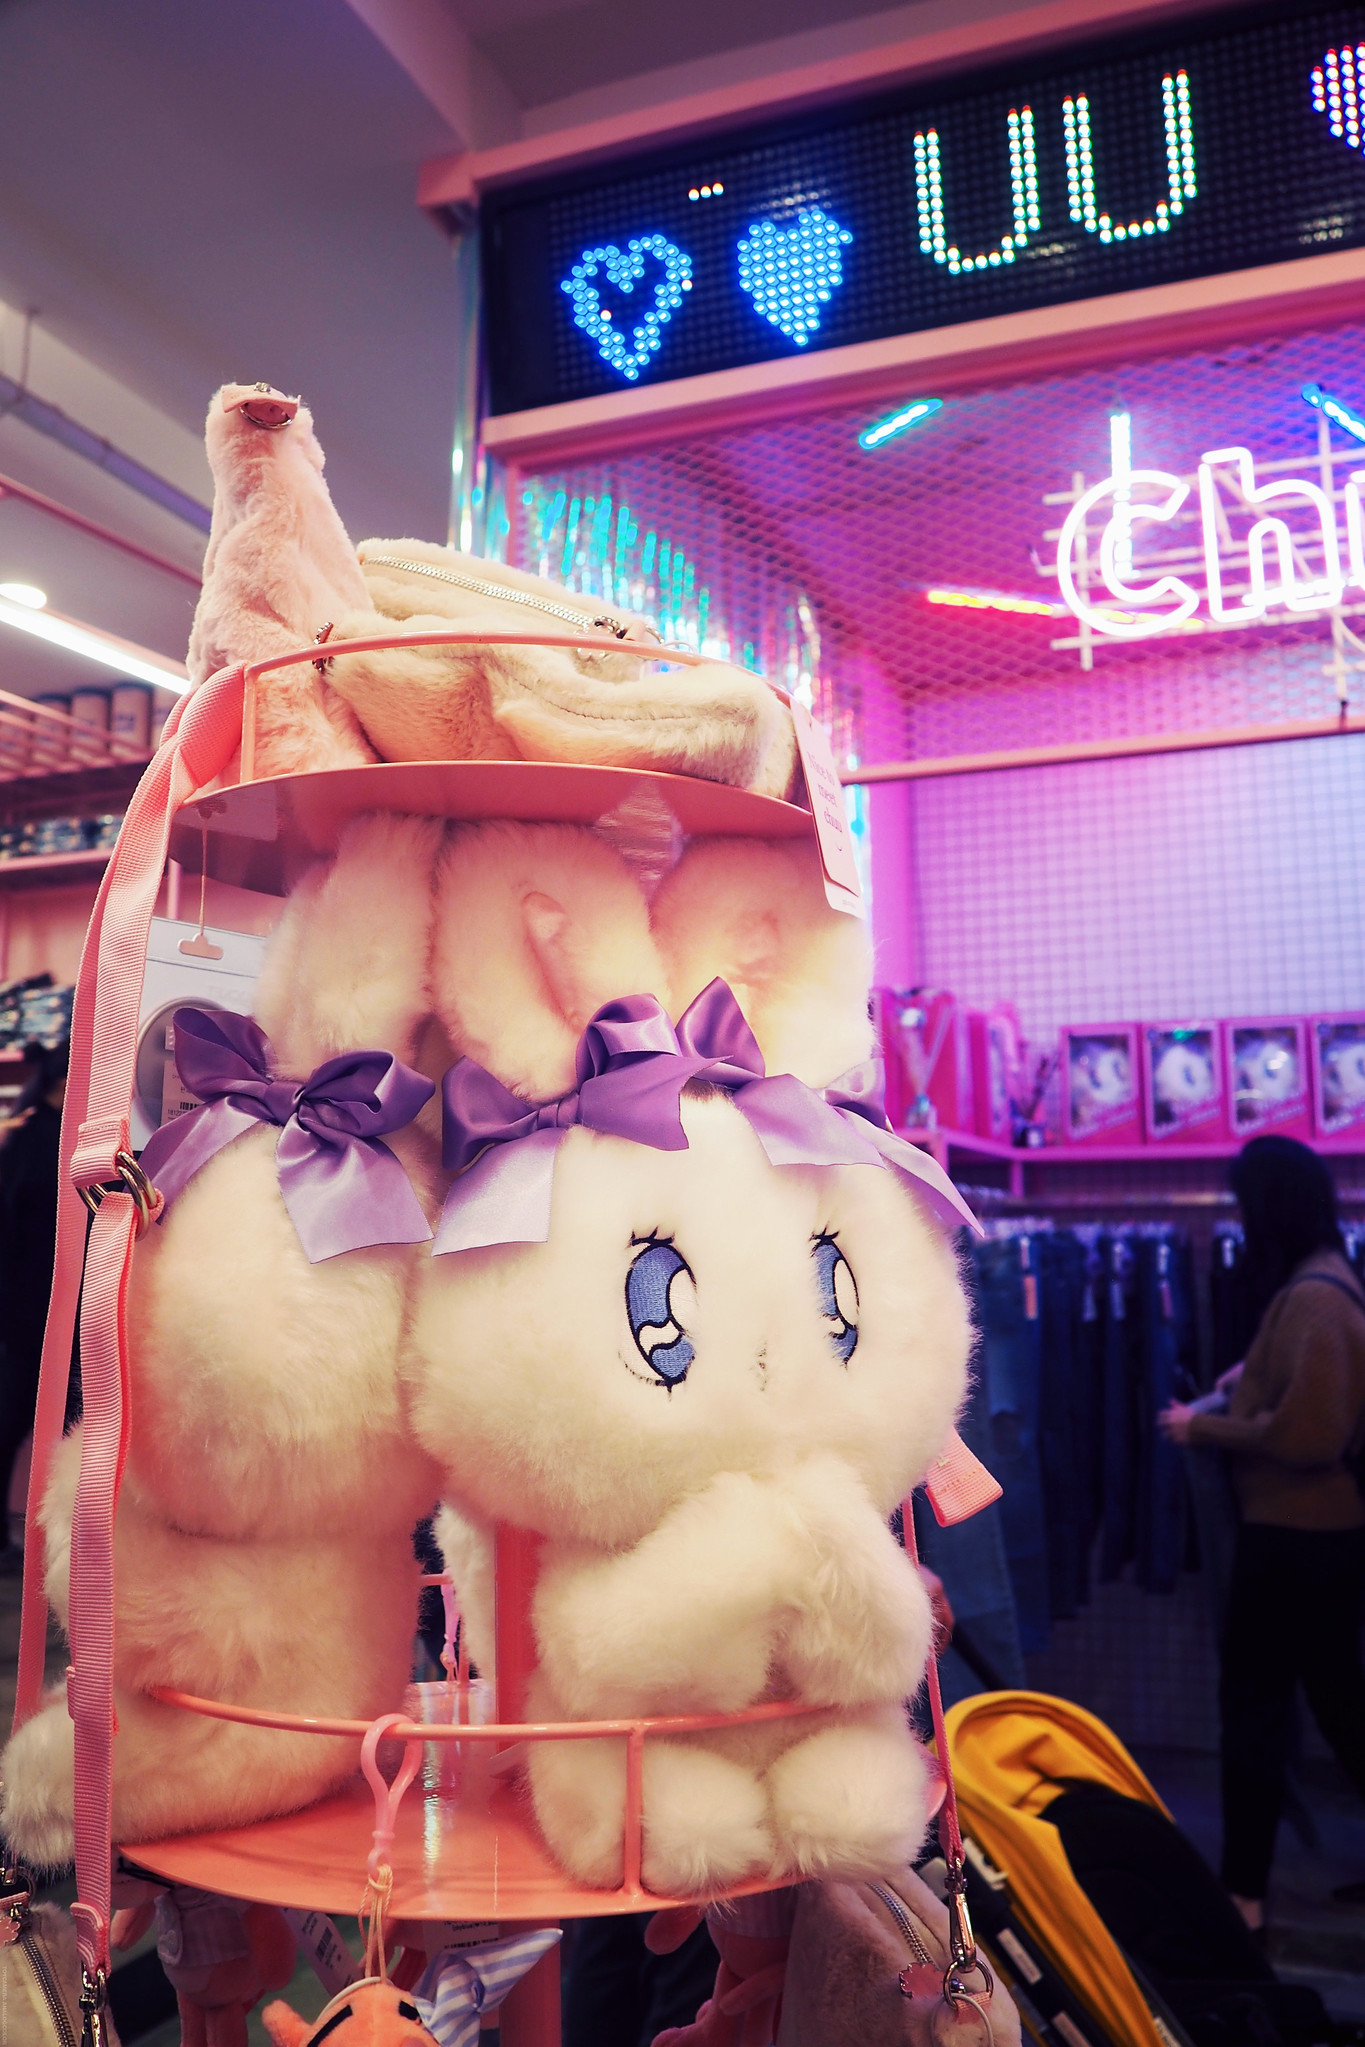 Estherlovesyou Teddy Bear Plushie Esther Bunny_effected